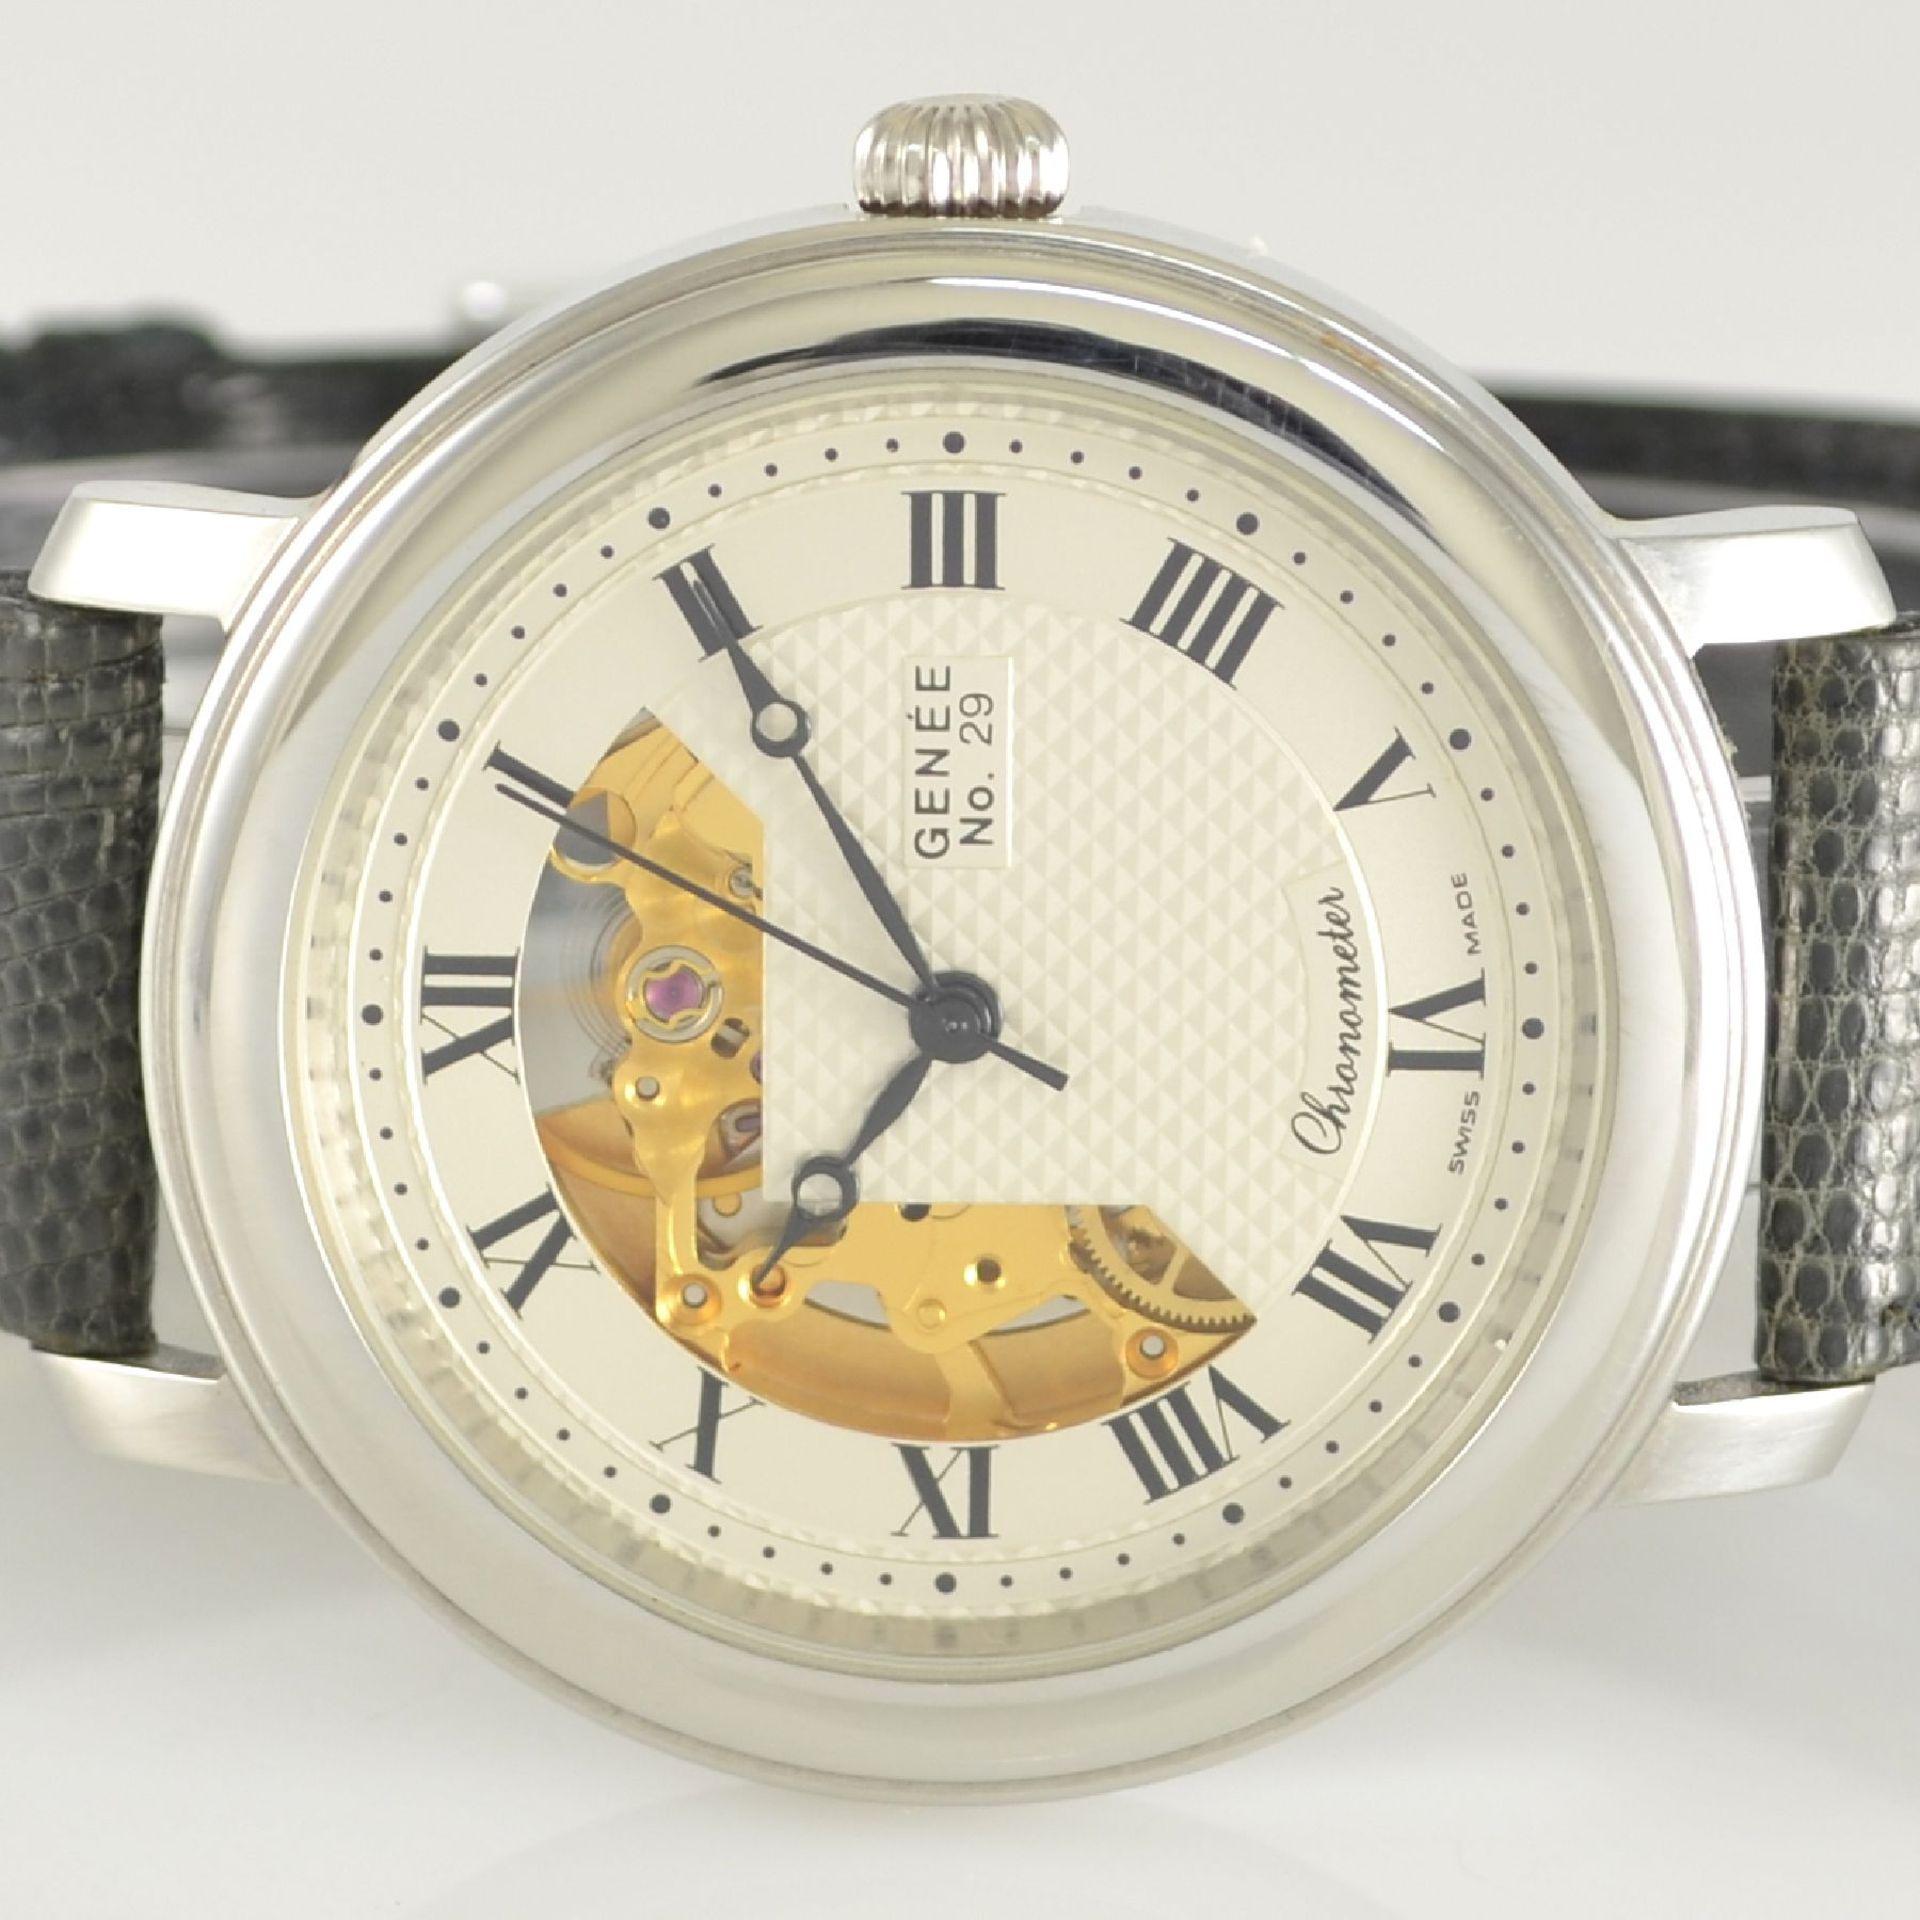 GENÉE No. 29 Chronometer-Herrenarmbanduhr in Stahl, Schweiz lt. beiliegendem Chronometerzertifikat - Bild 2 aus 8